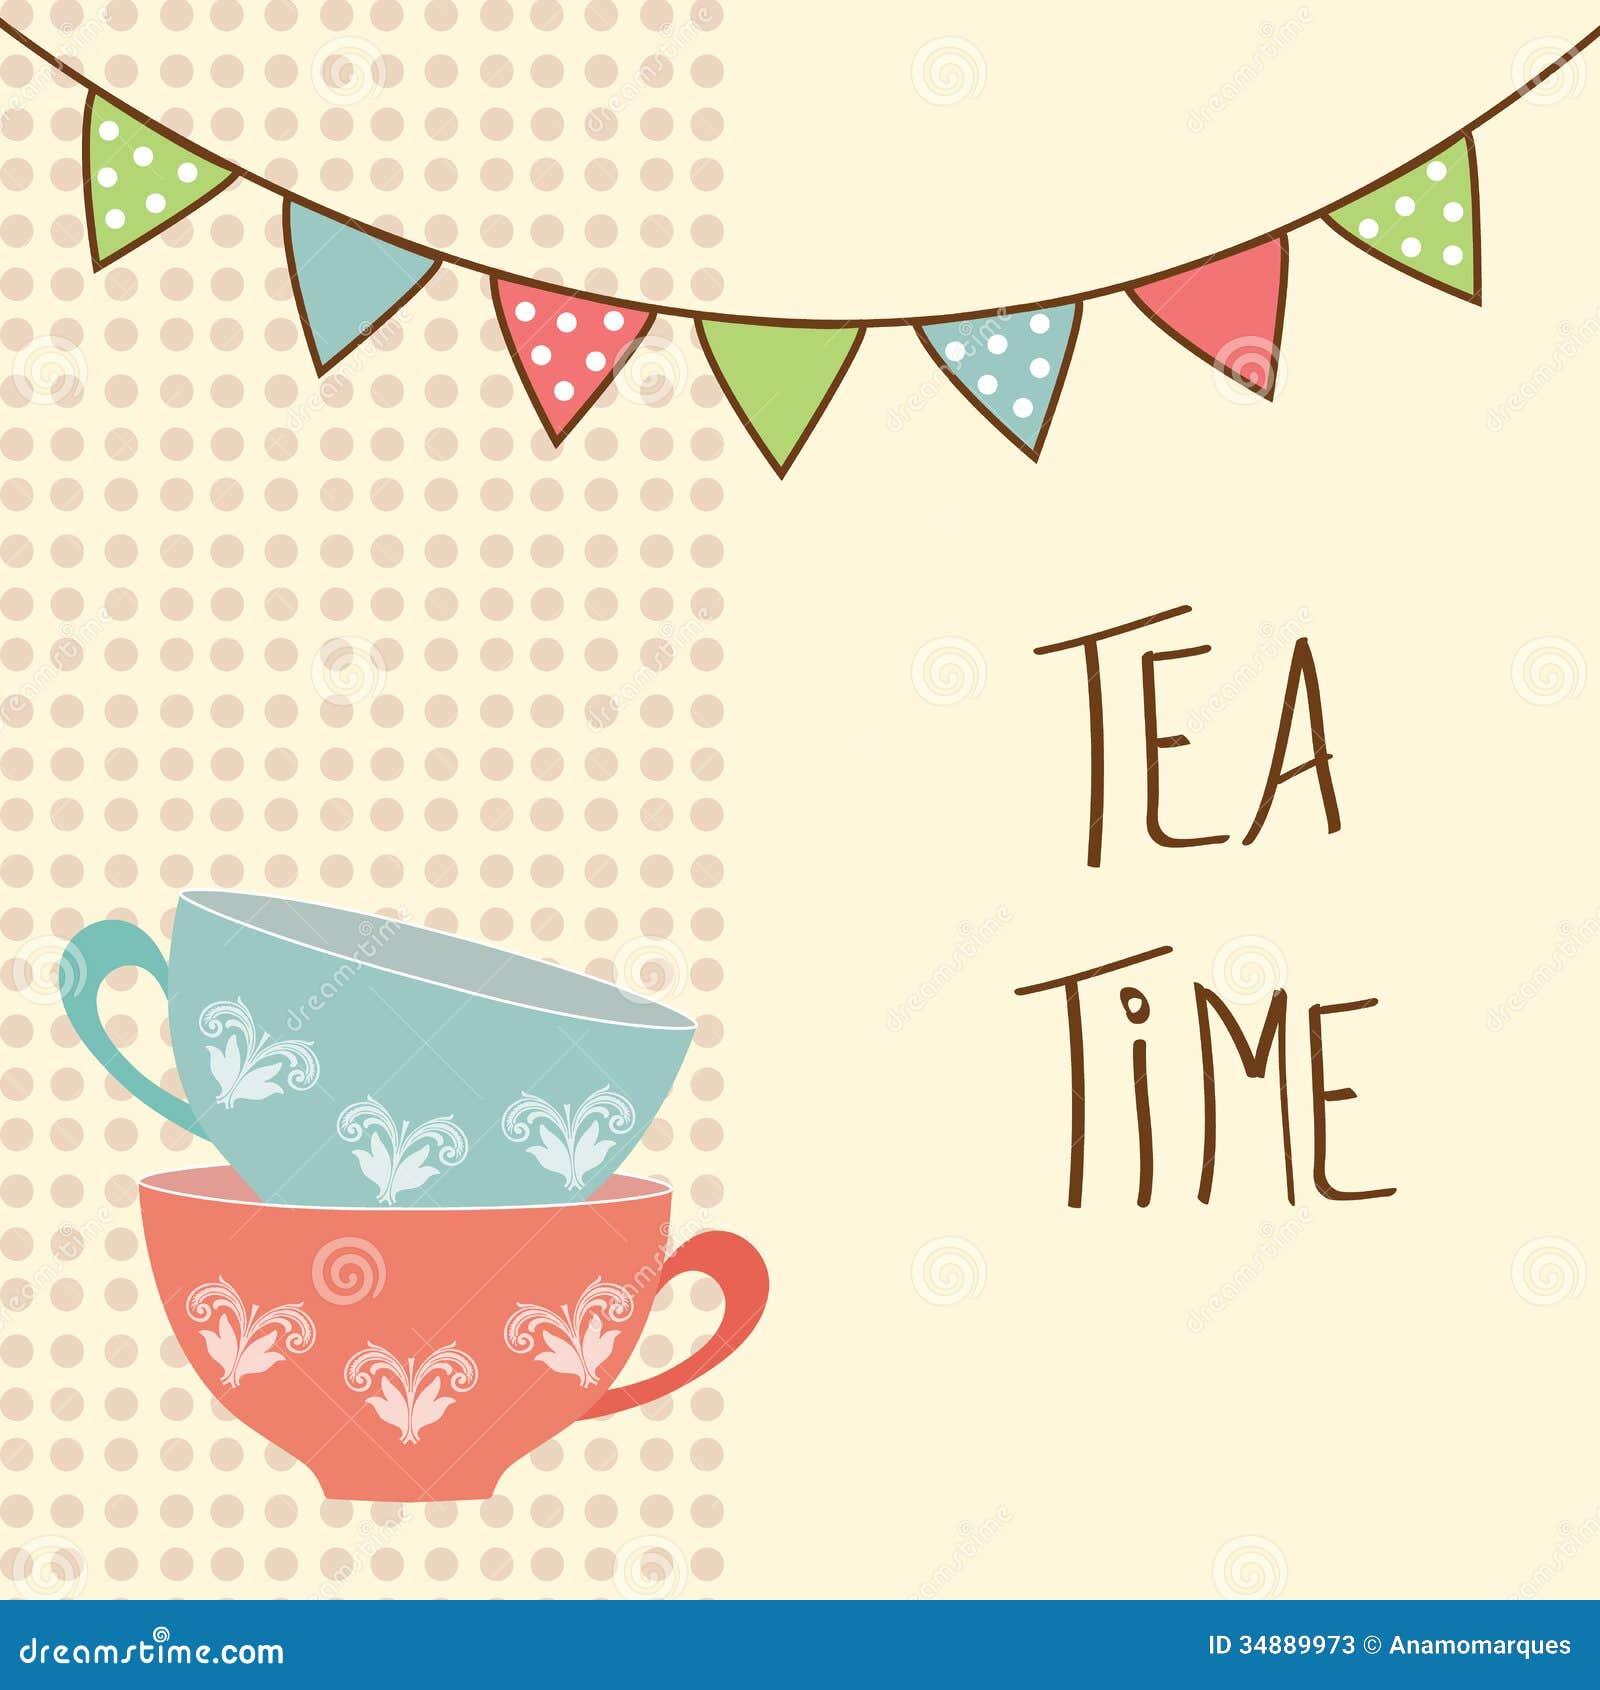 tea time stock photos image 34889973. Black Bedroom Furniture Sets. Home Design Ideas